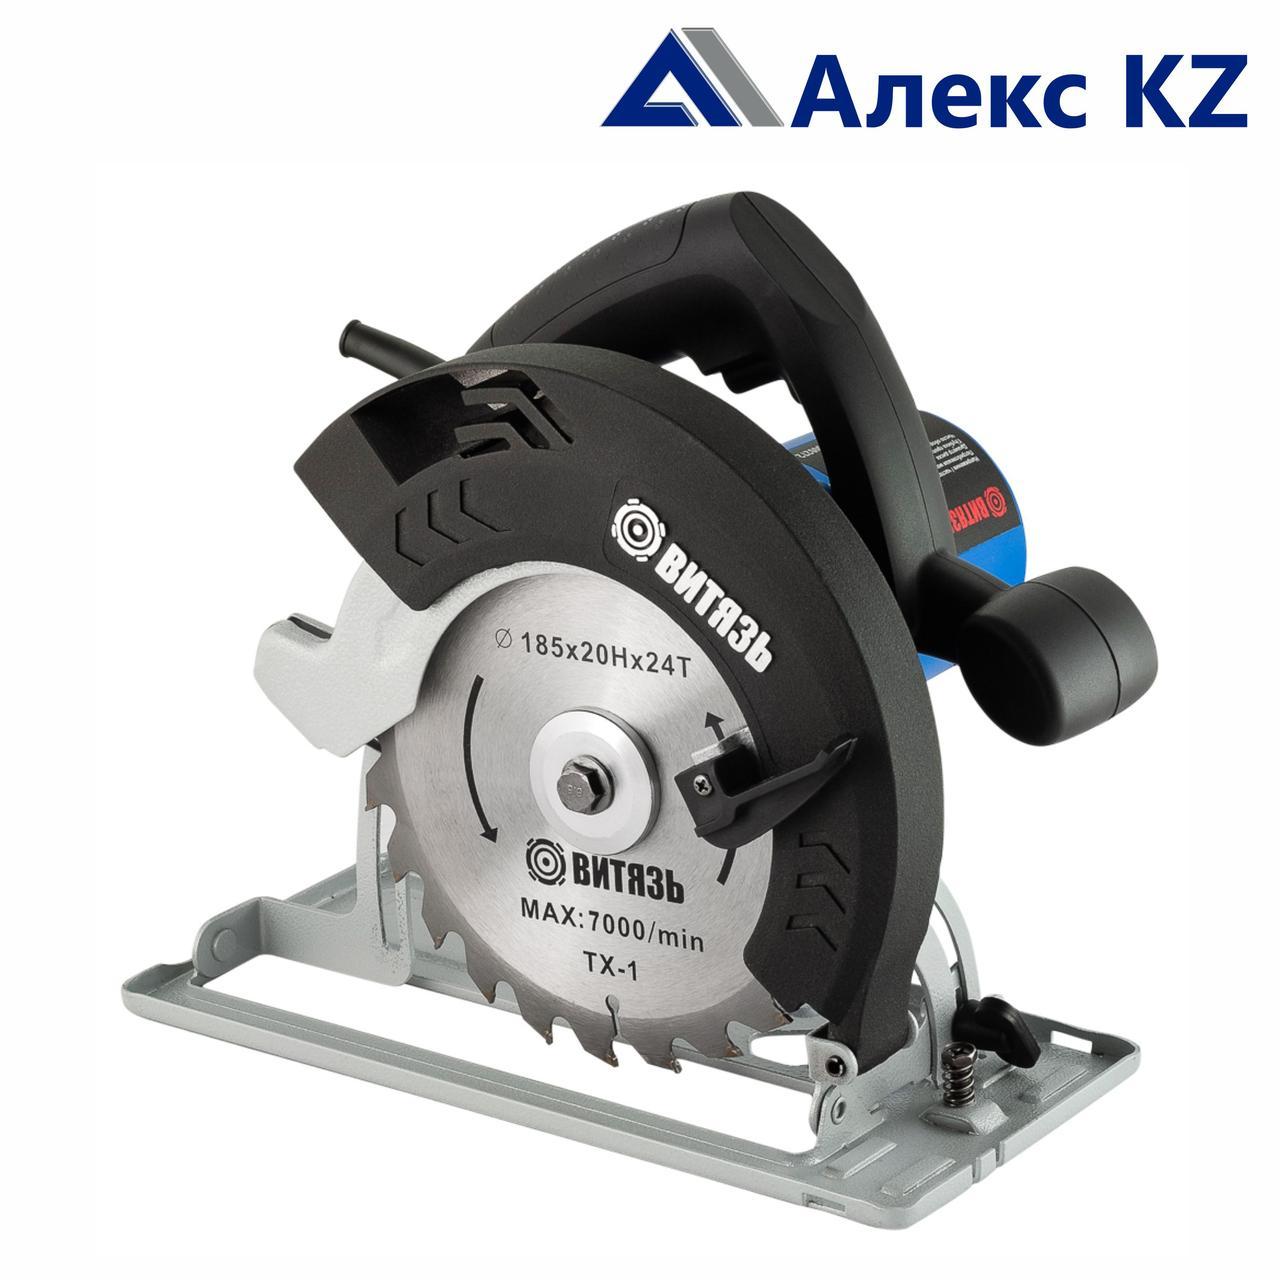 Витязь ПД-2200М Пила дисковая